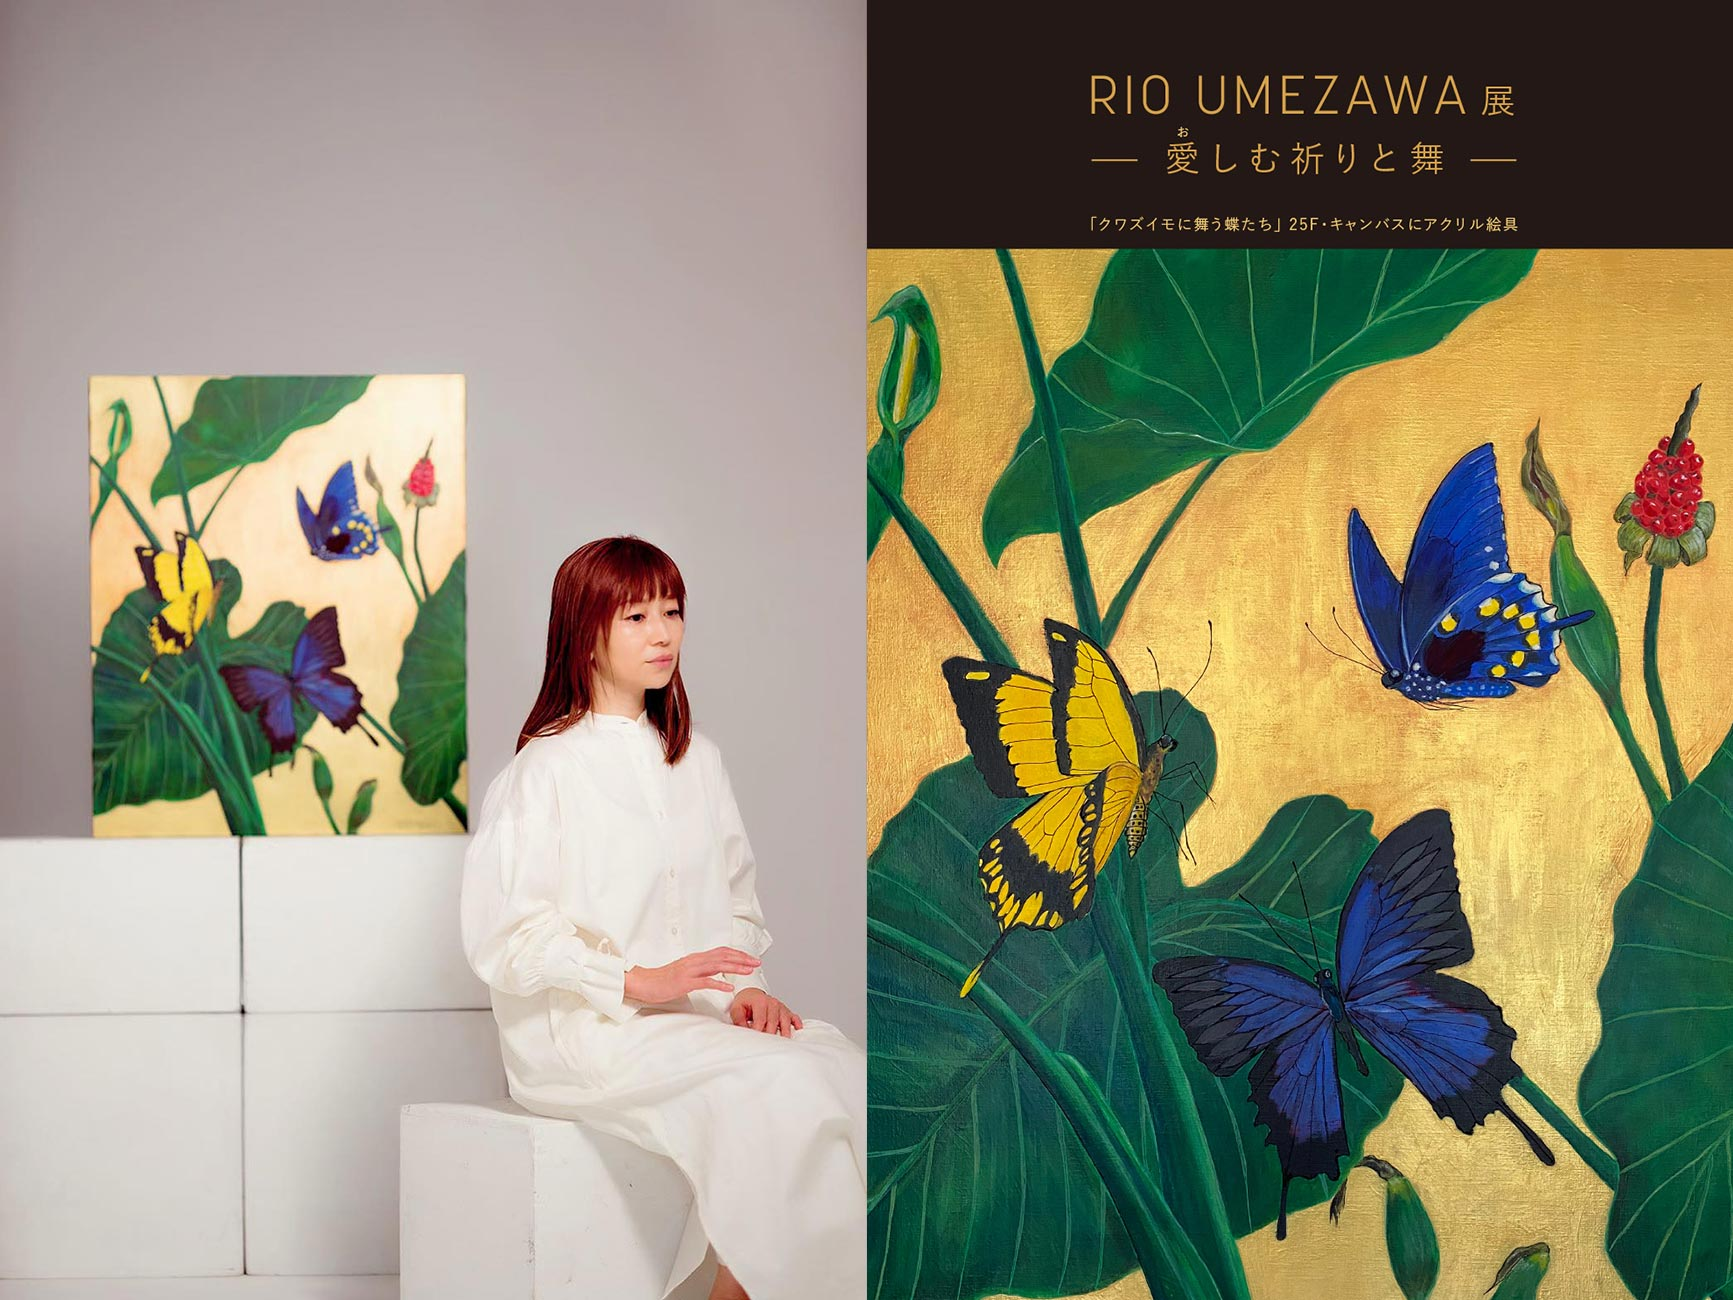 RIO UMEZAWA展 ~愛しむ祈りと舞(おしむ \いのりとまい)~